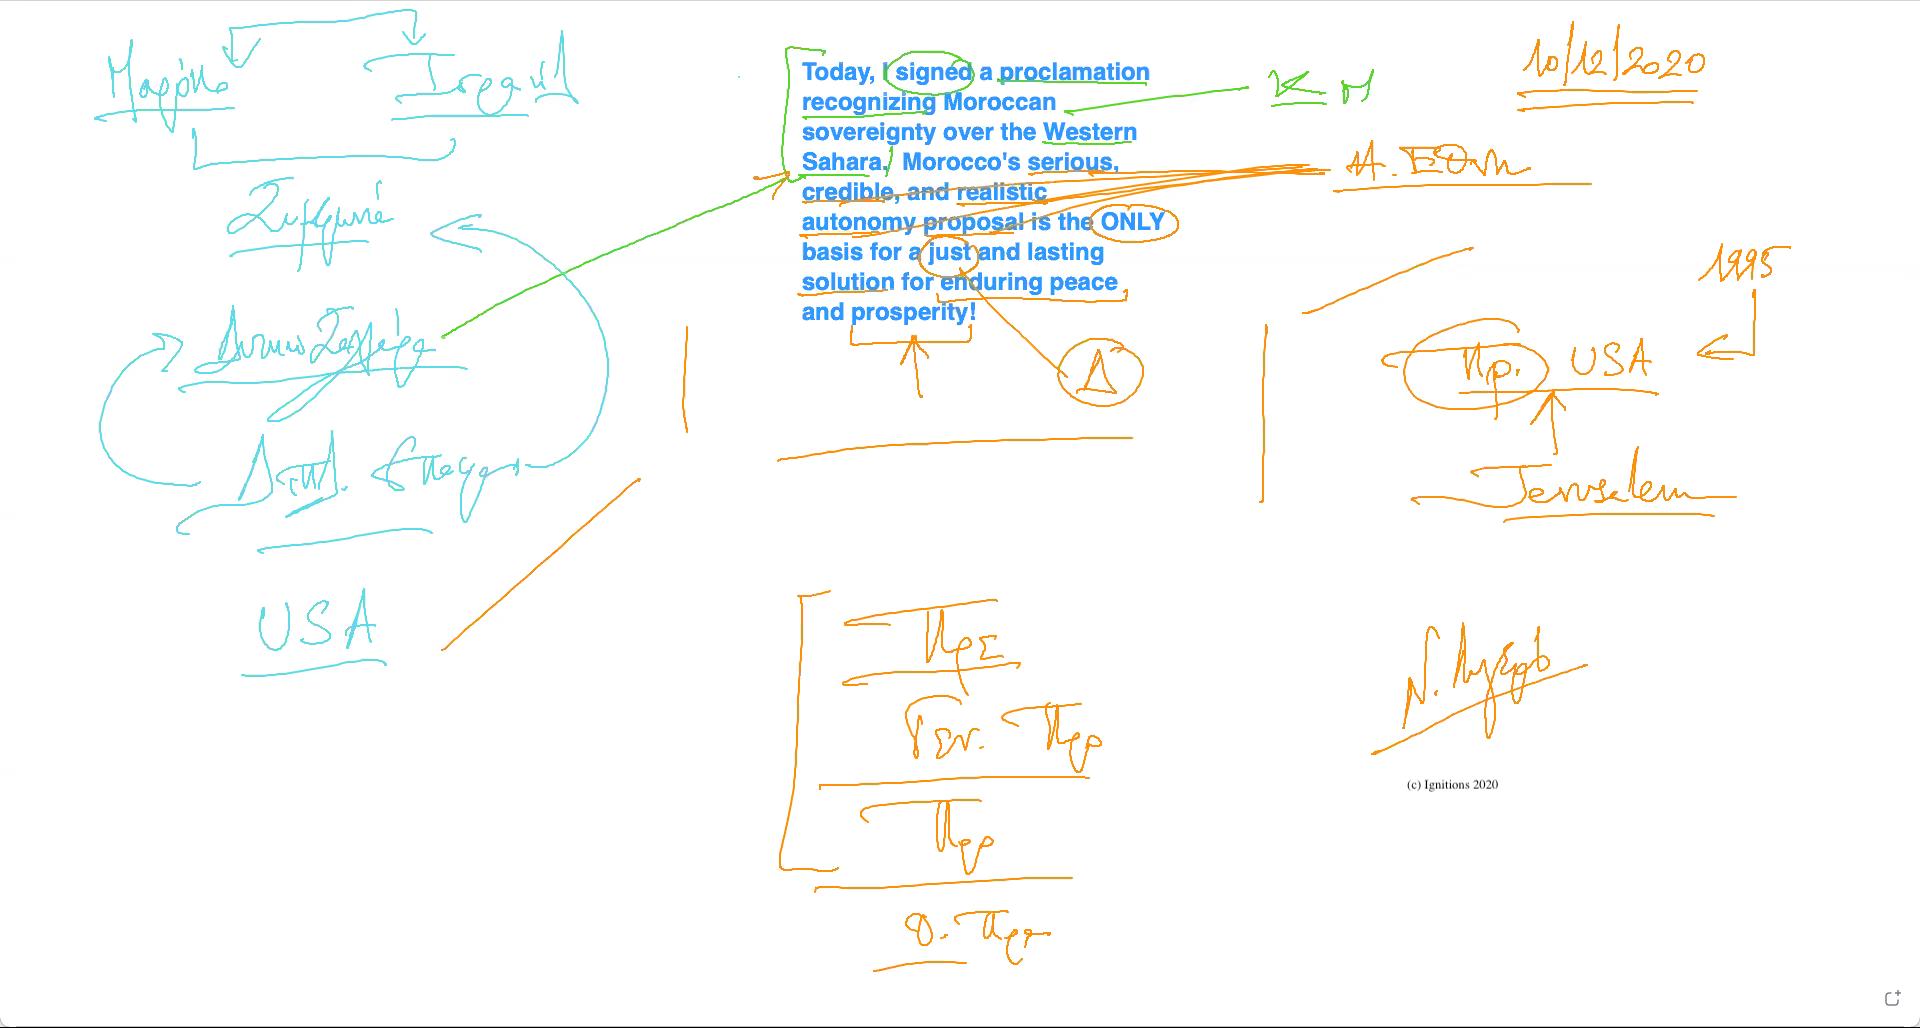 57014 - I - e-Μάθημα: Στρατηγική και Διπλωματία: Μαρόκο, Ισραήλ και ΗΠΑ. (Dessin)